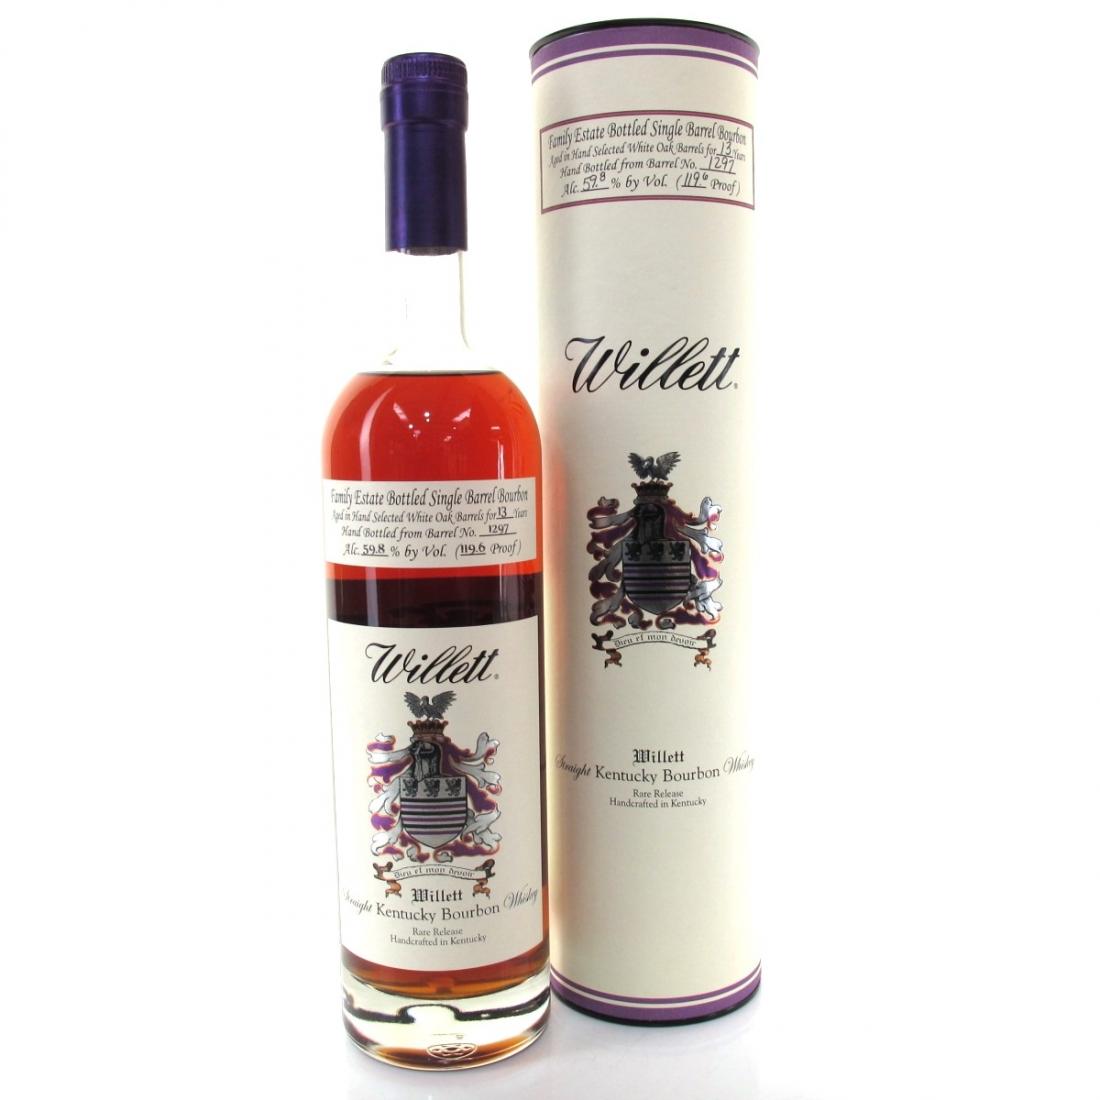 Willett Family Estate 13 Year Old Single Barrel Bourbon #1297